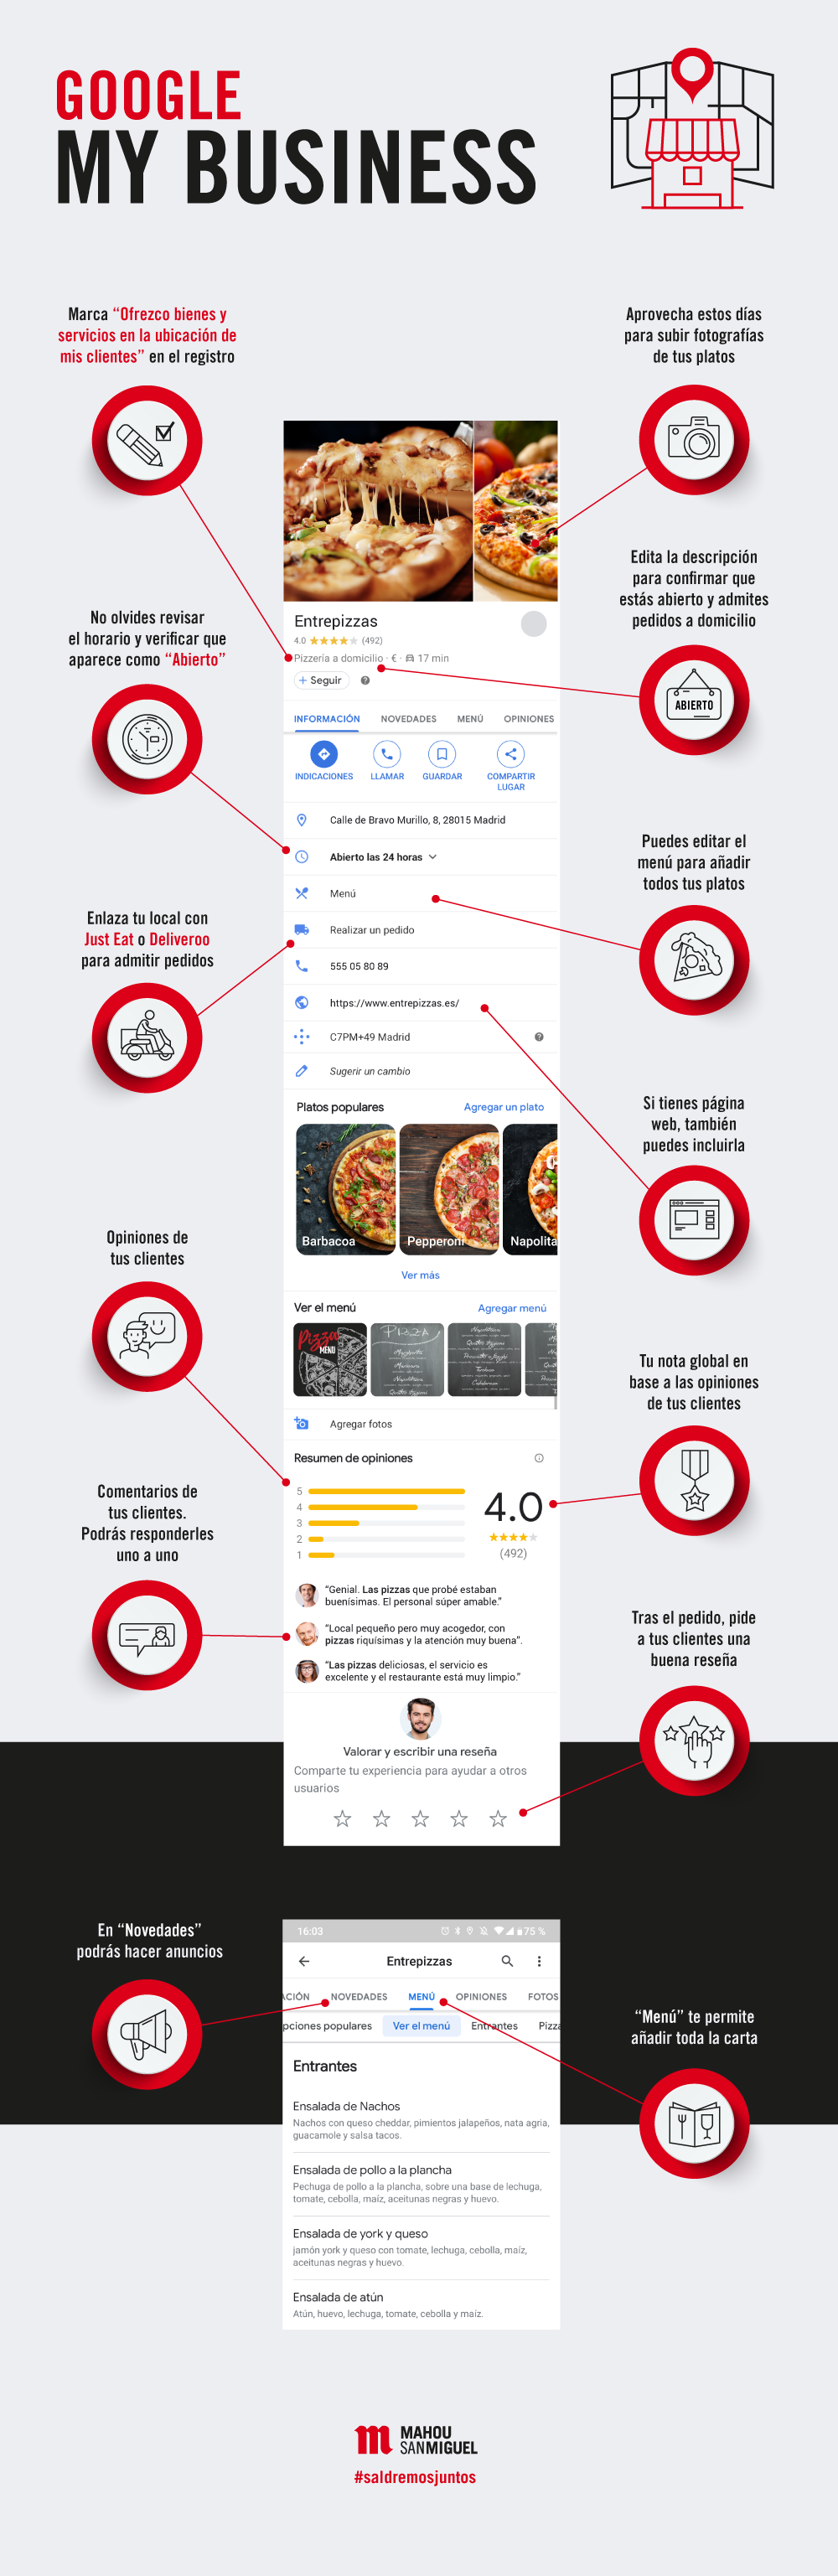 Rentabilibar-infografia-google-business